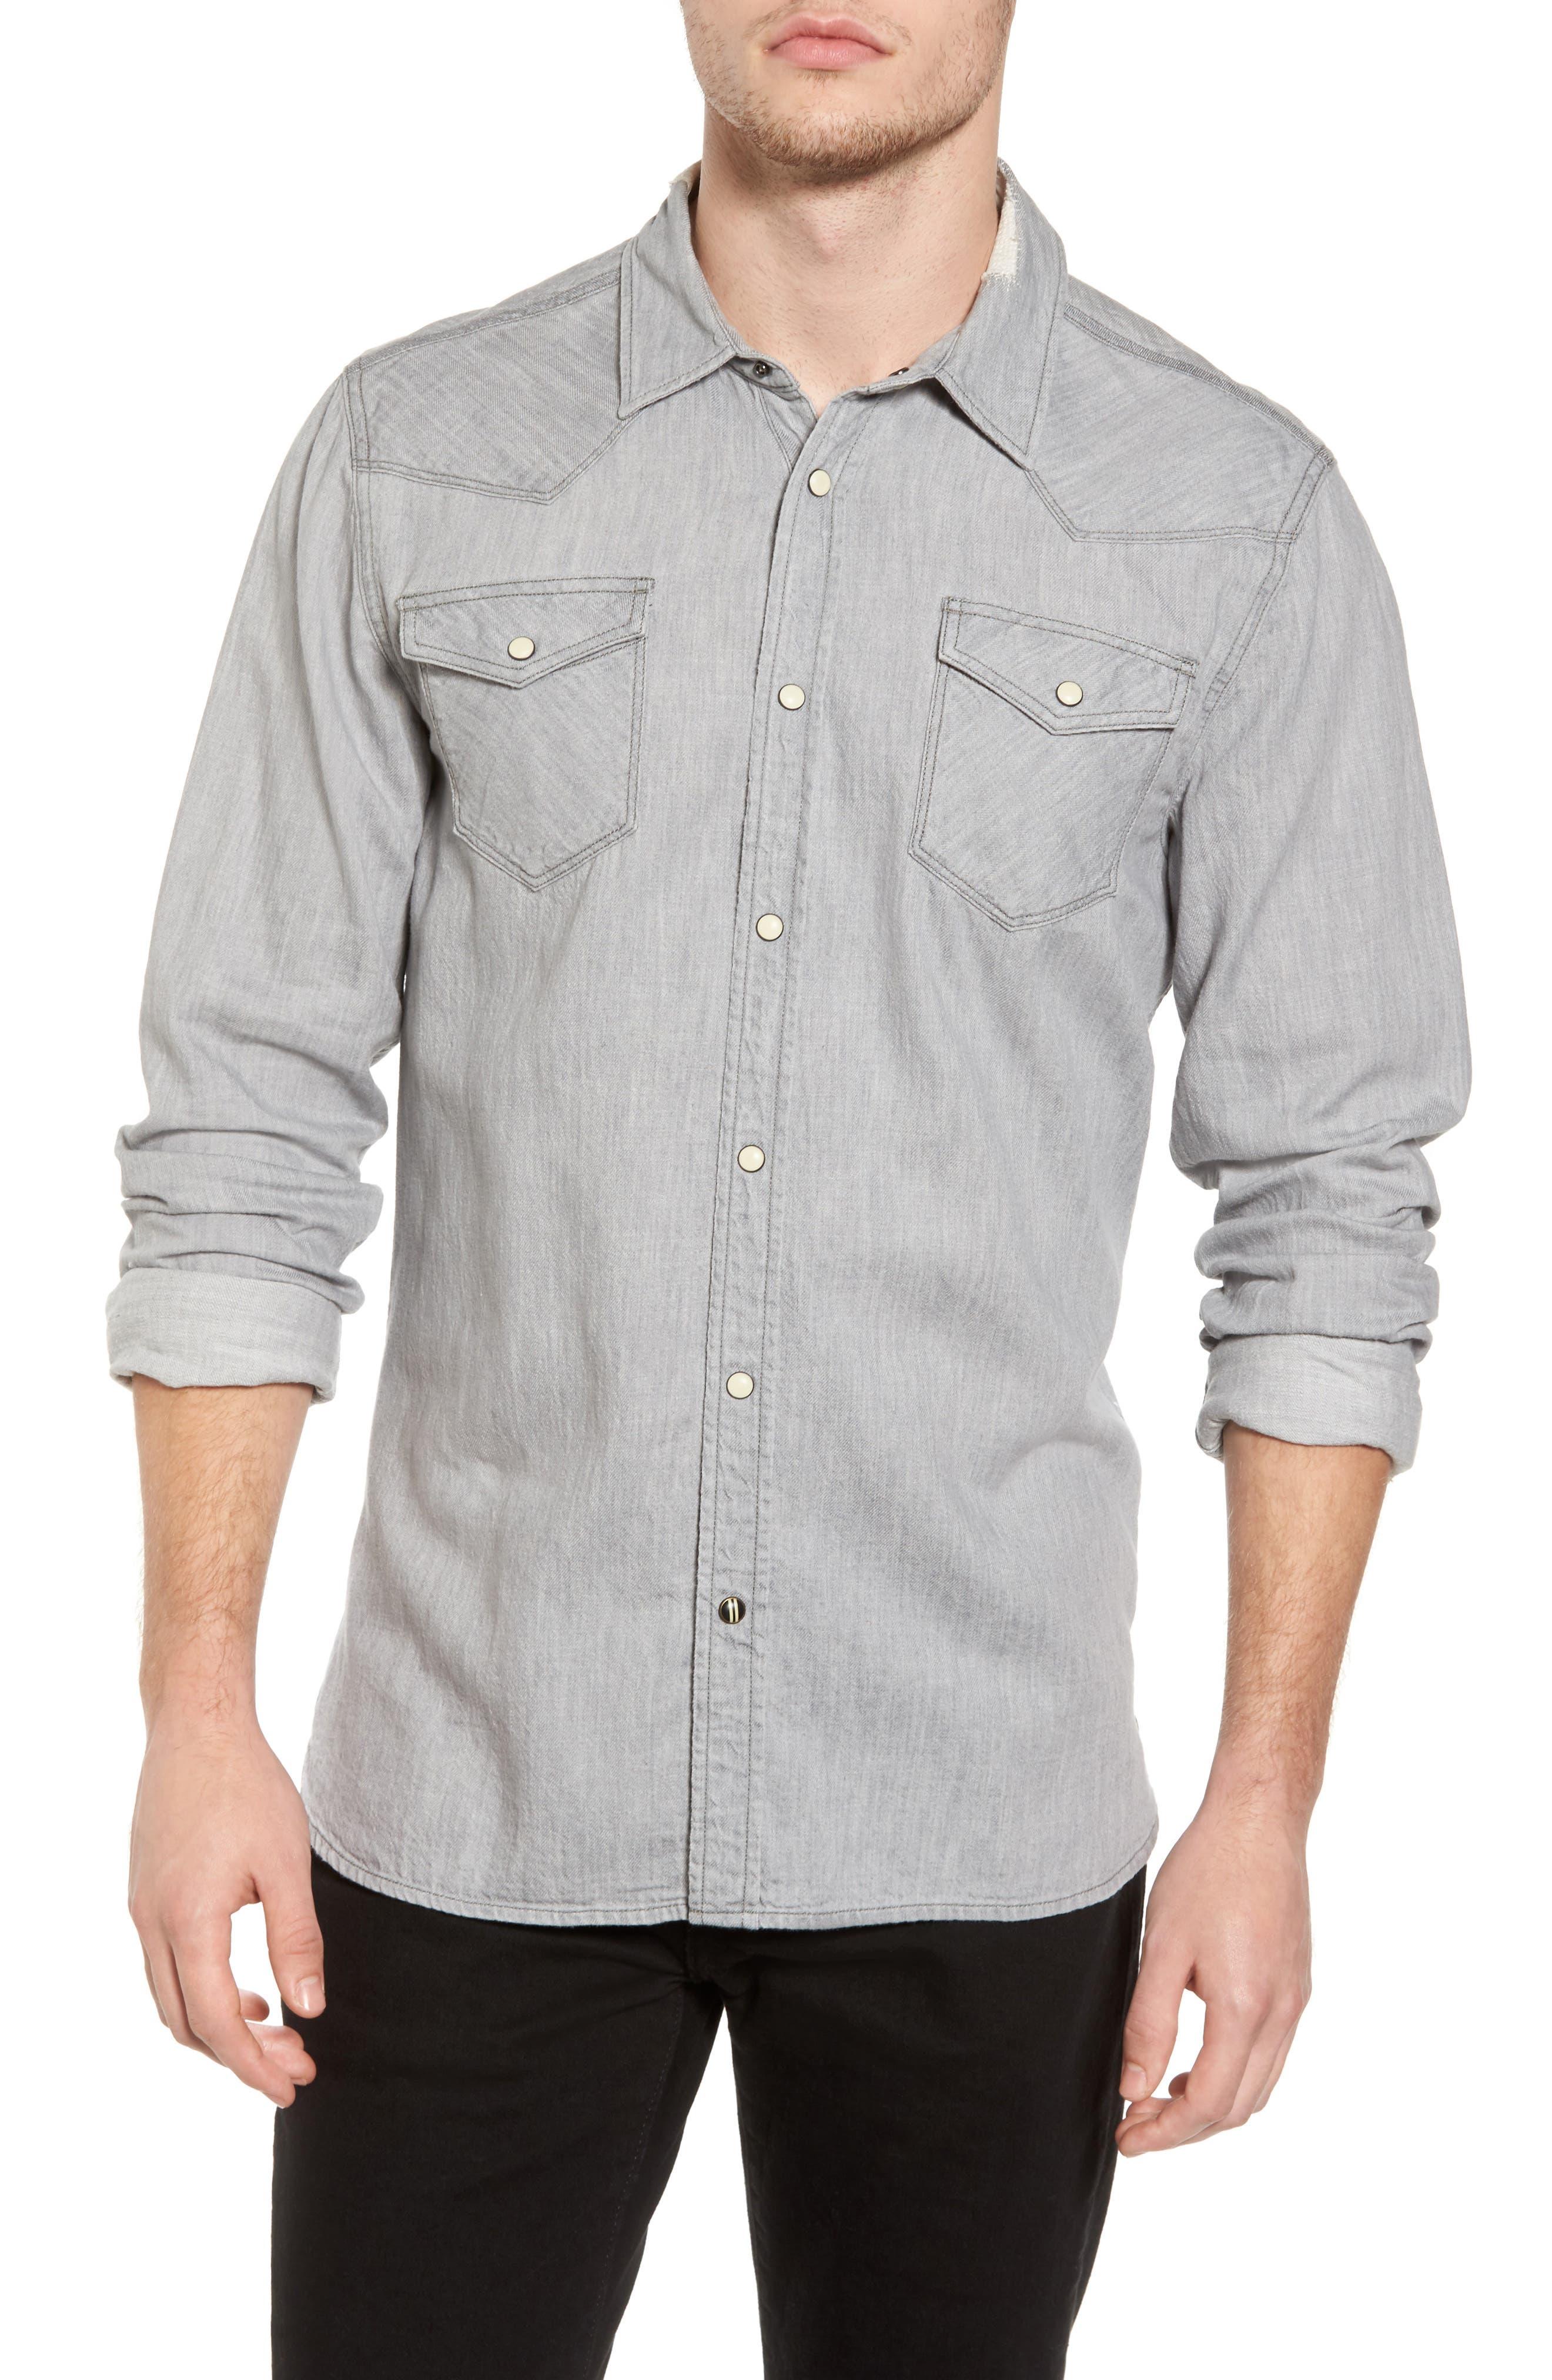 Alternate Image 1 Selected - Scotch & Soda Classic Western Shirt